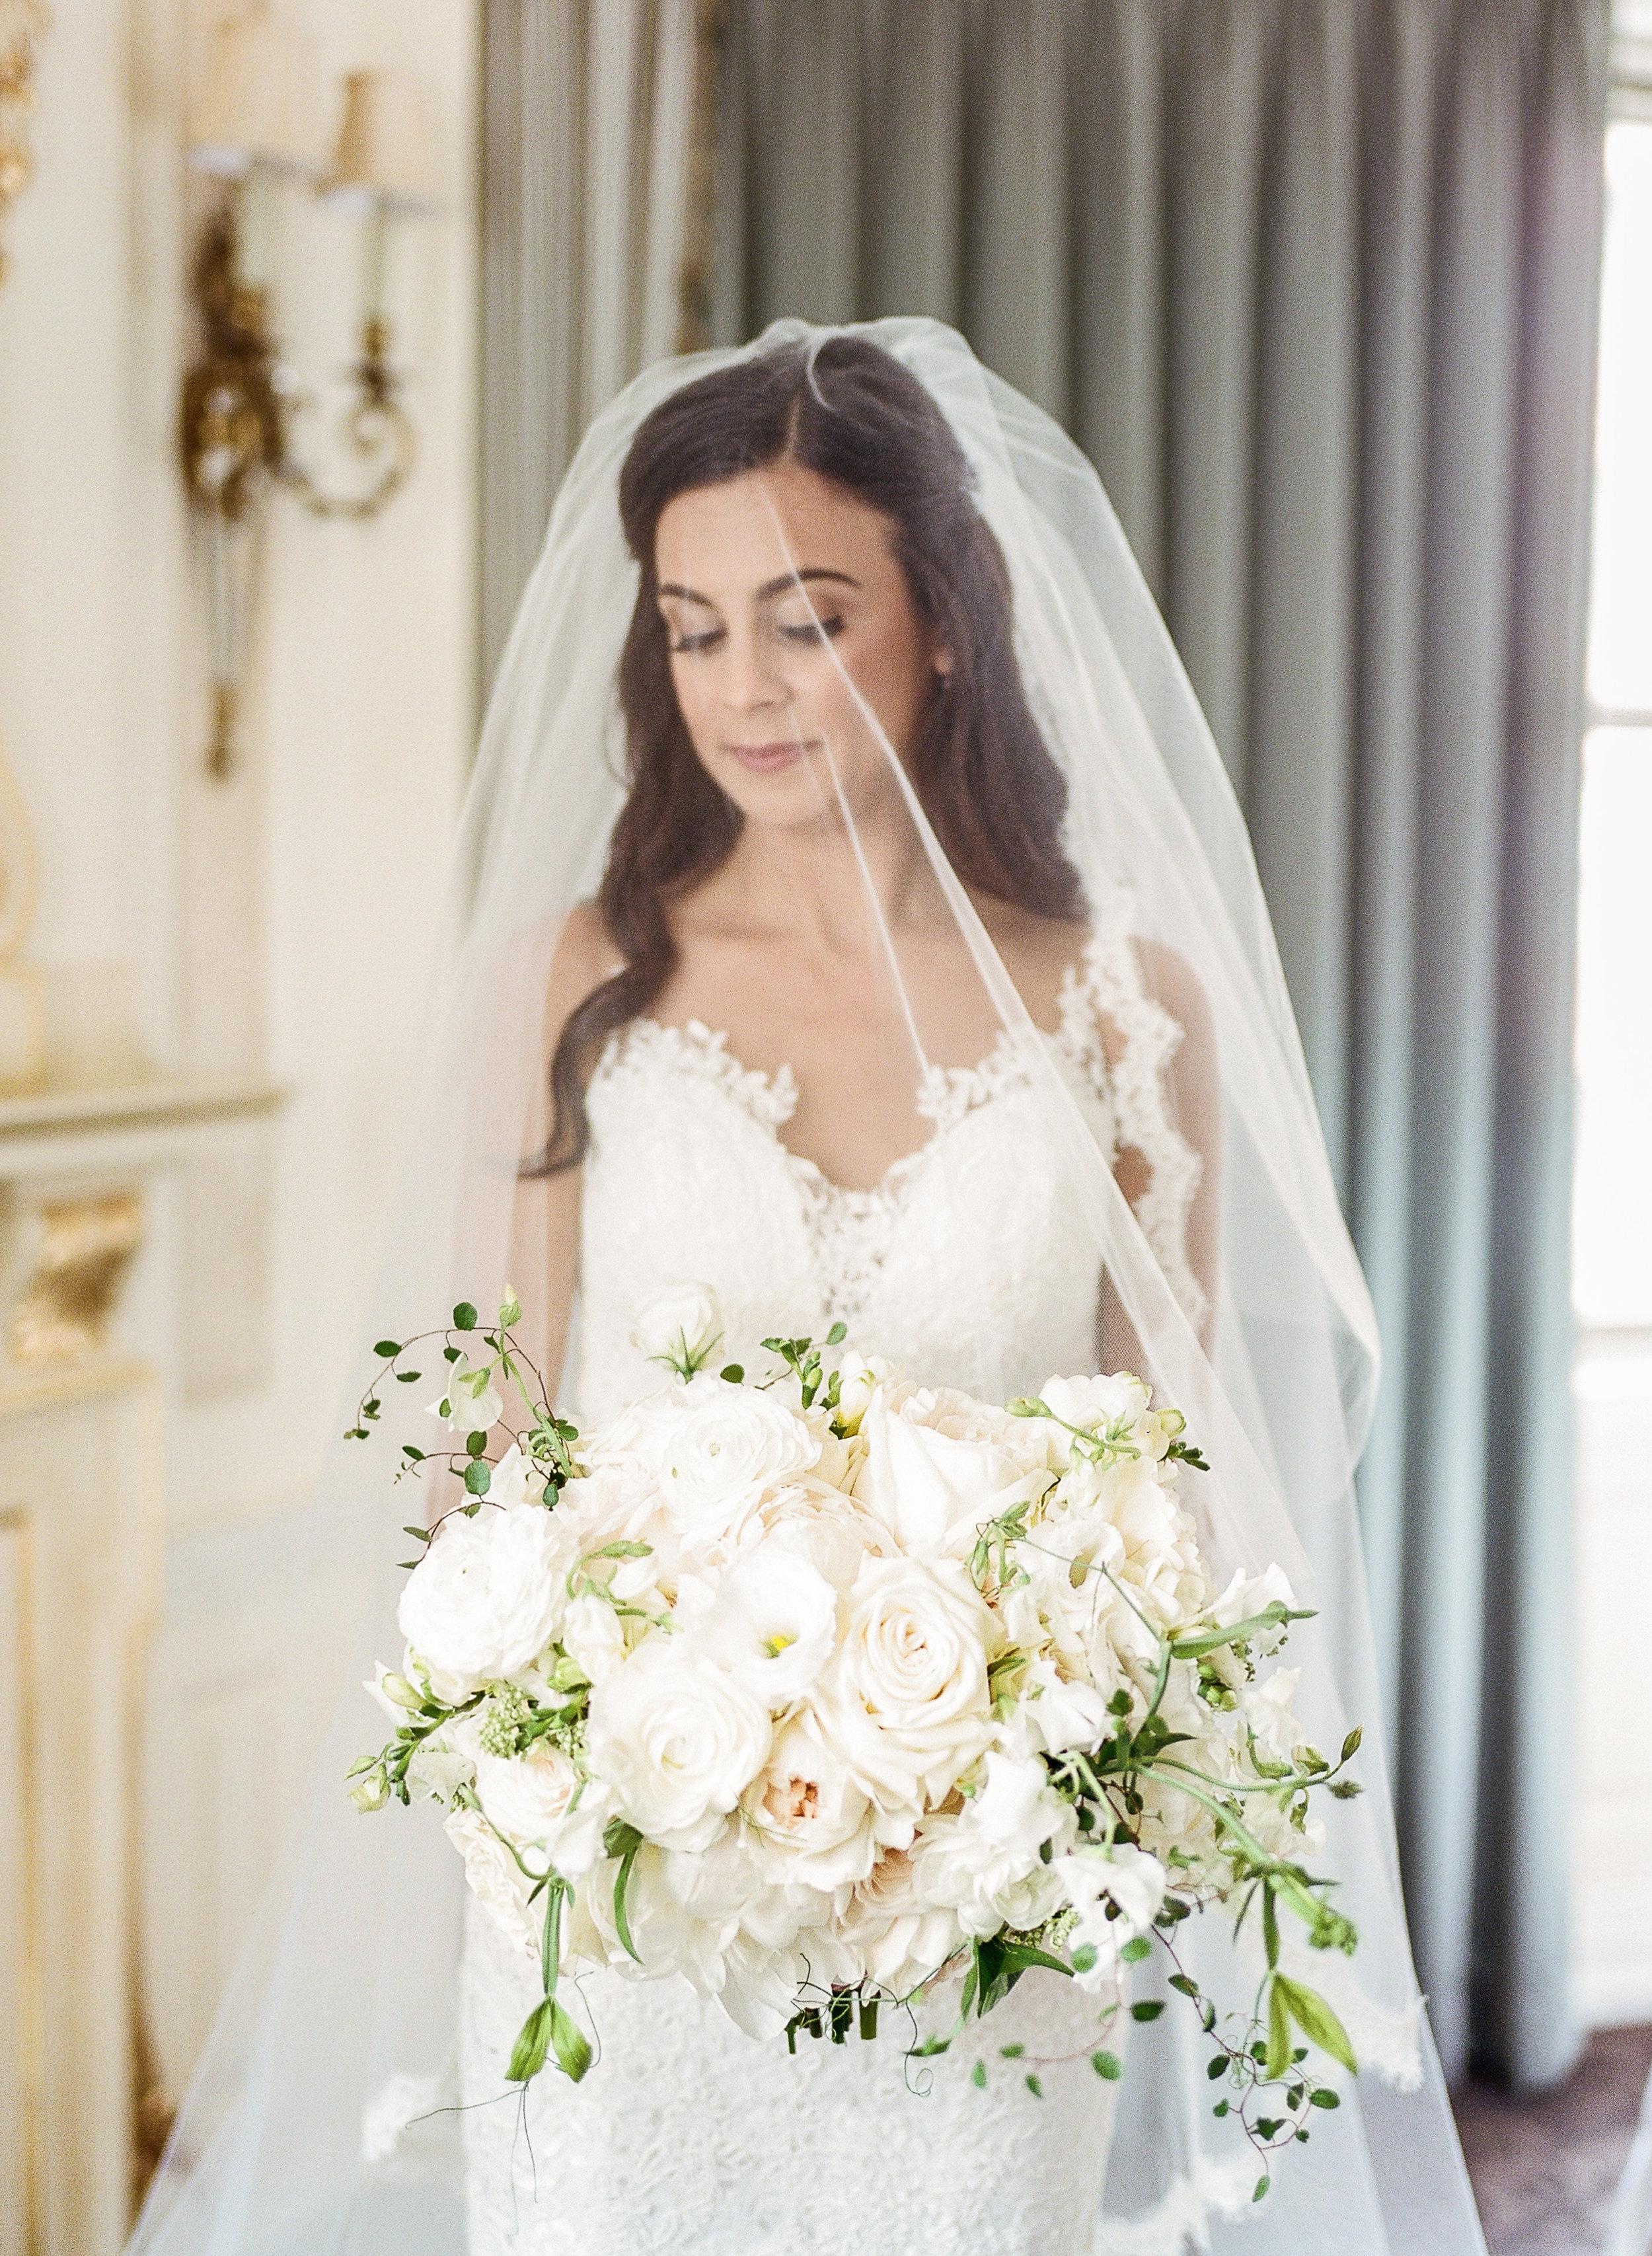 Cournoyer Wedding by Michelle Lange Photography-36.jpg